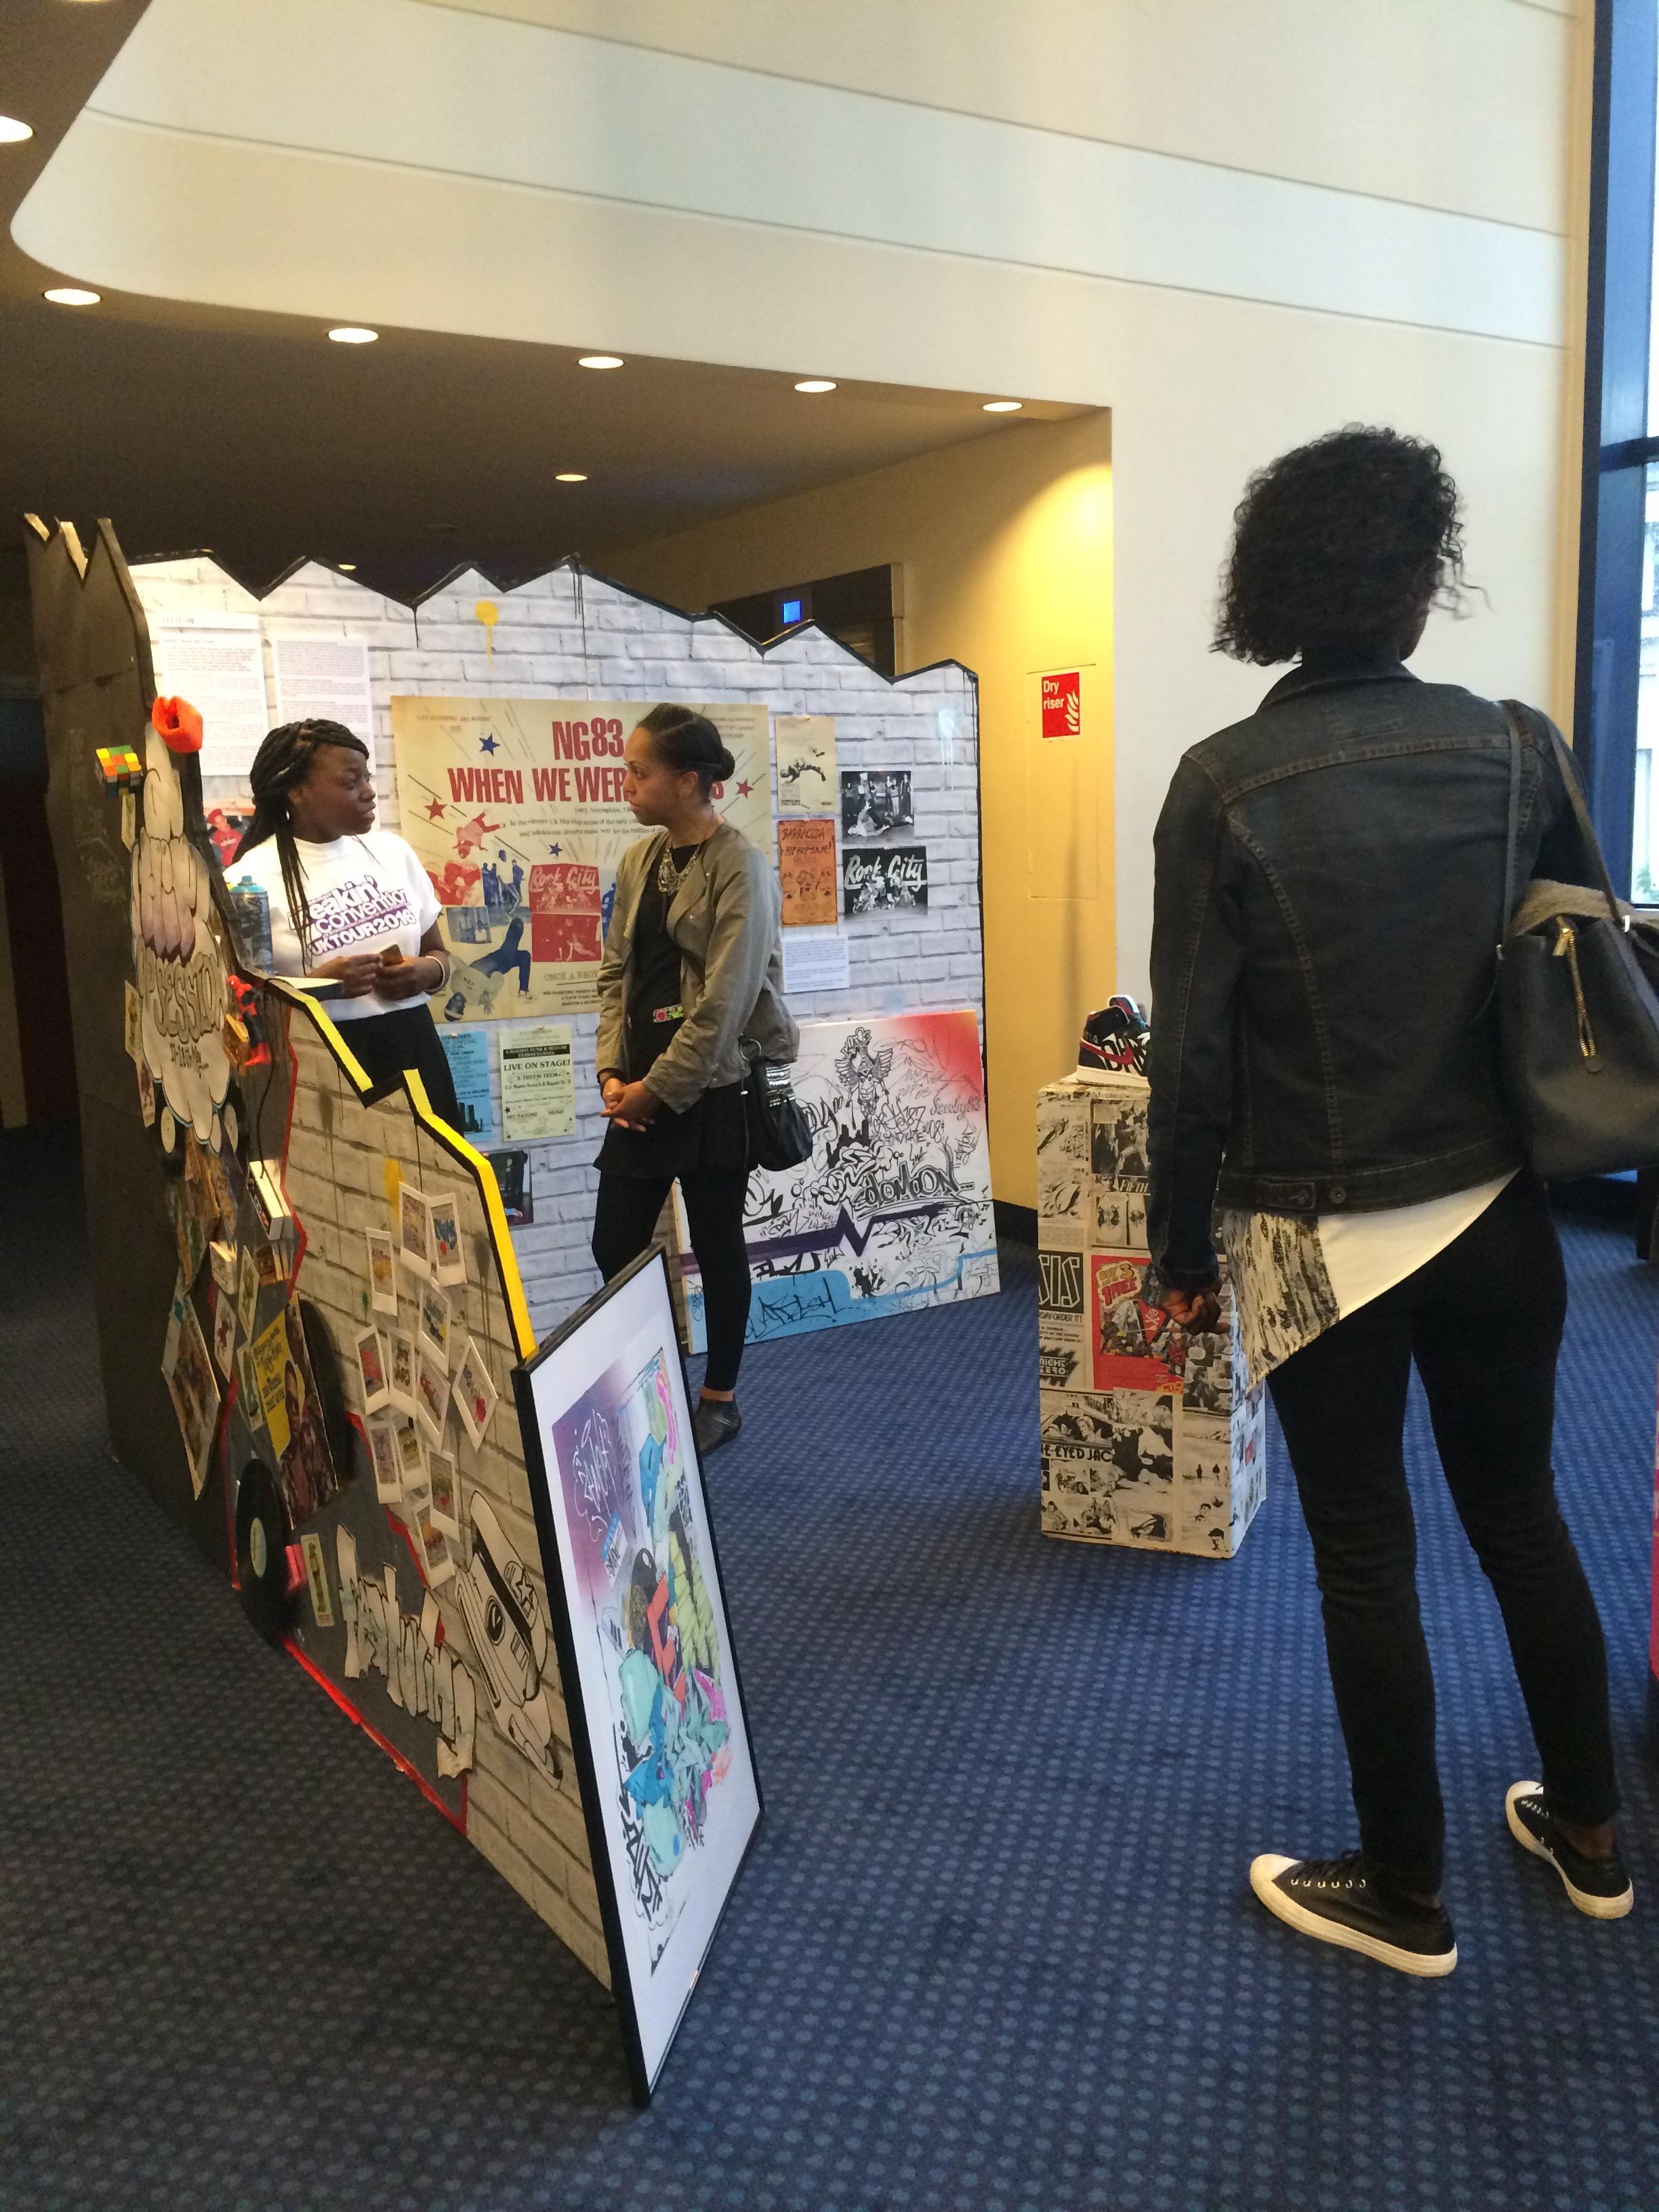 Saziso Phiri at the Anti Gallery stand, repping Nottingham.